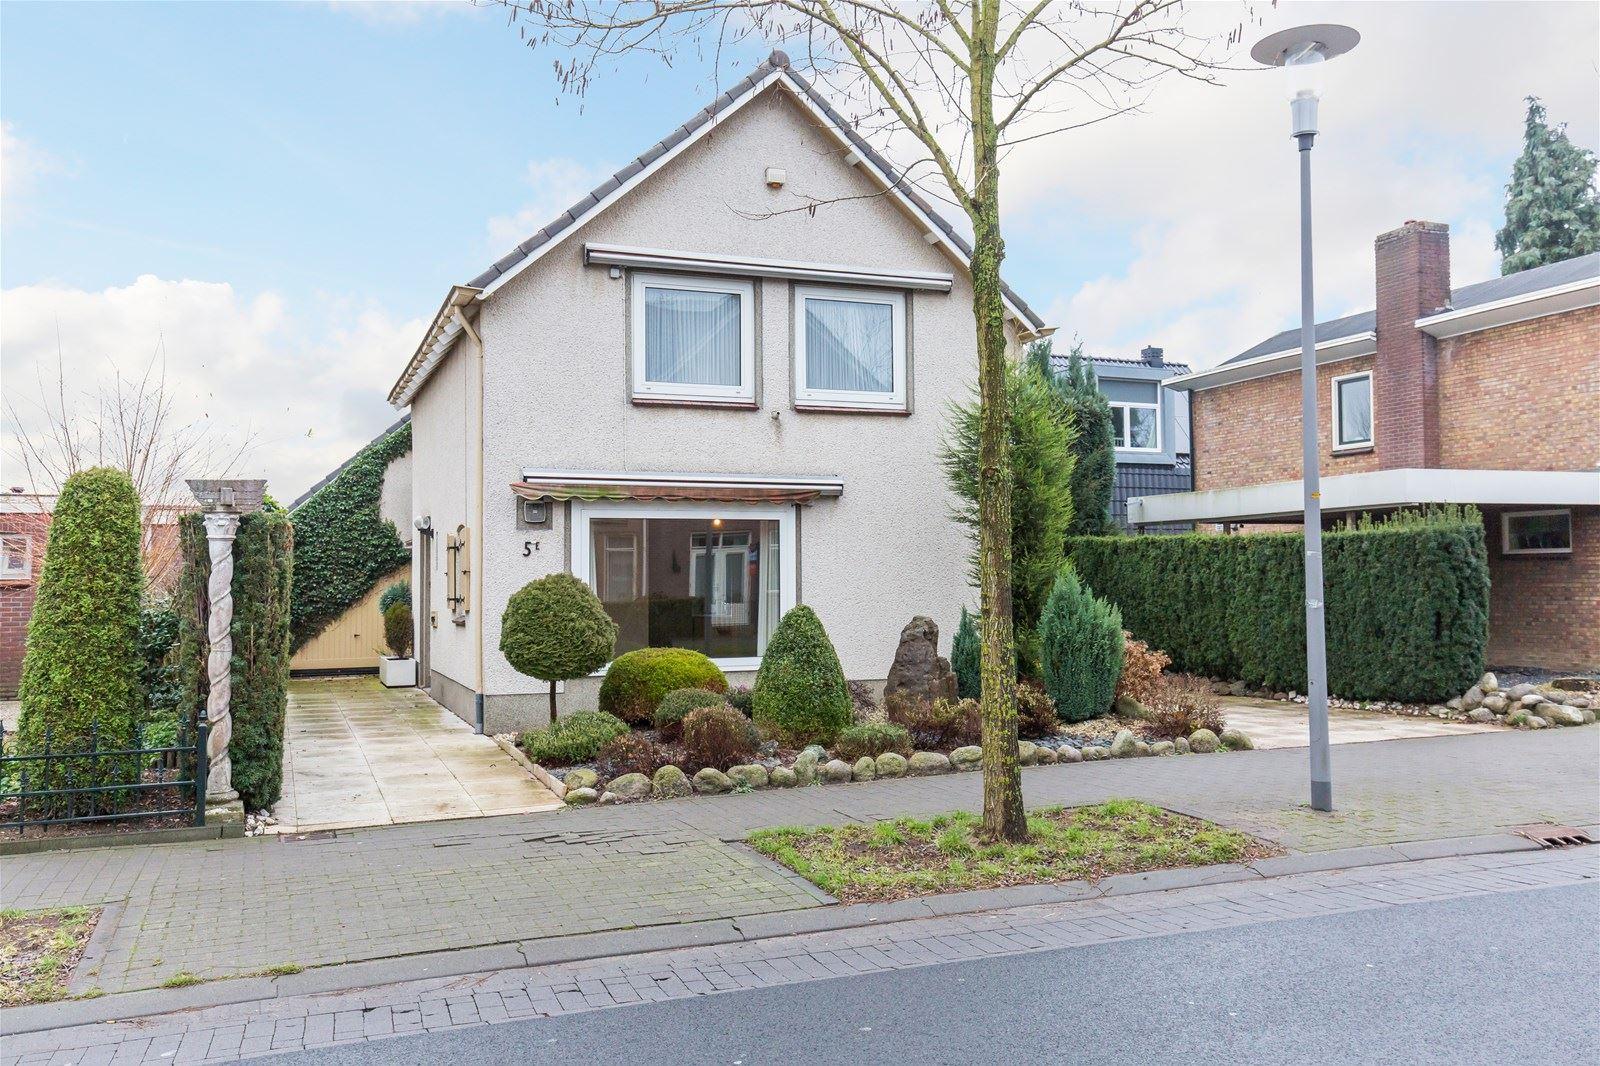 Huis te huur 39 s heerenbergseweg 5 e 7038 ca zeddam funda for Te huur in gelderland